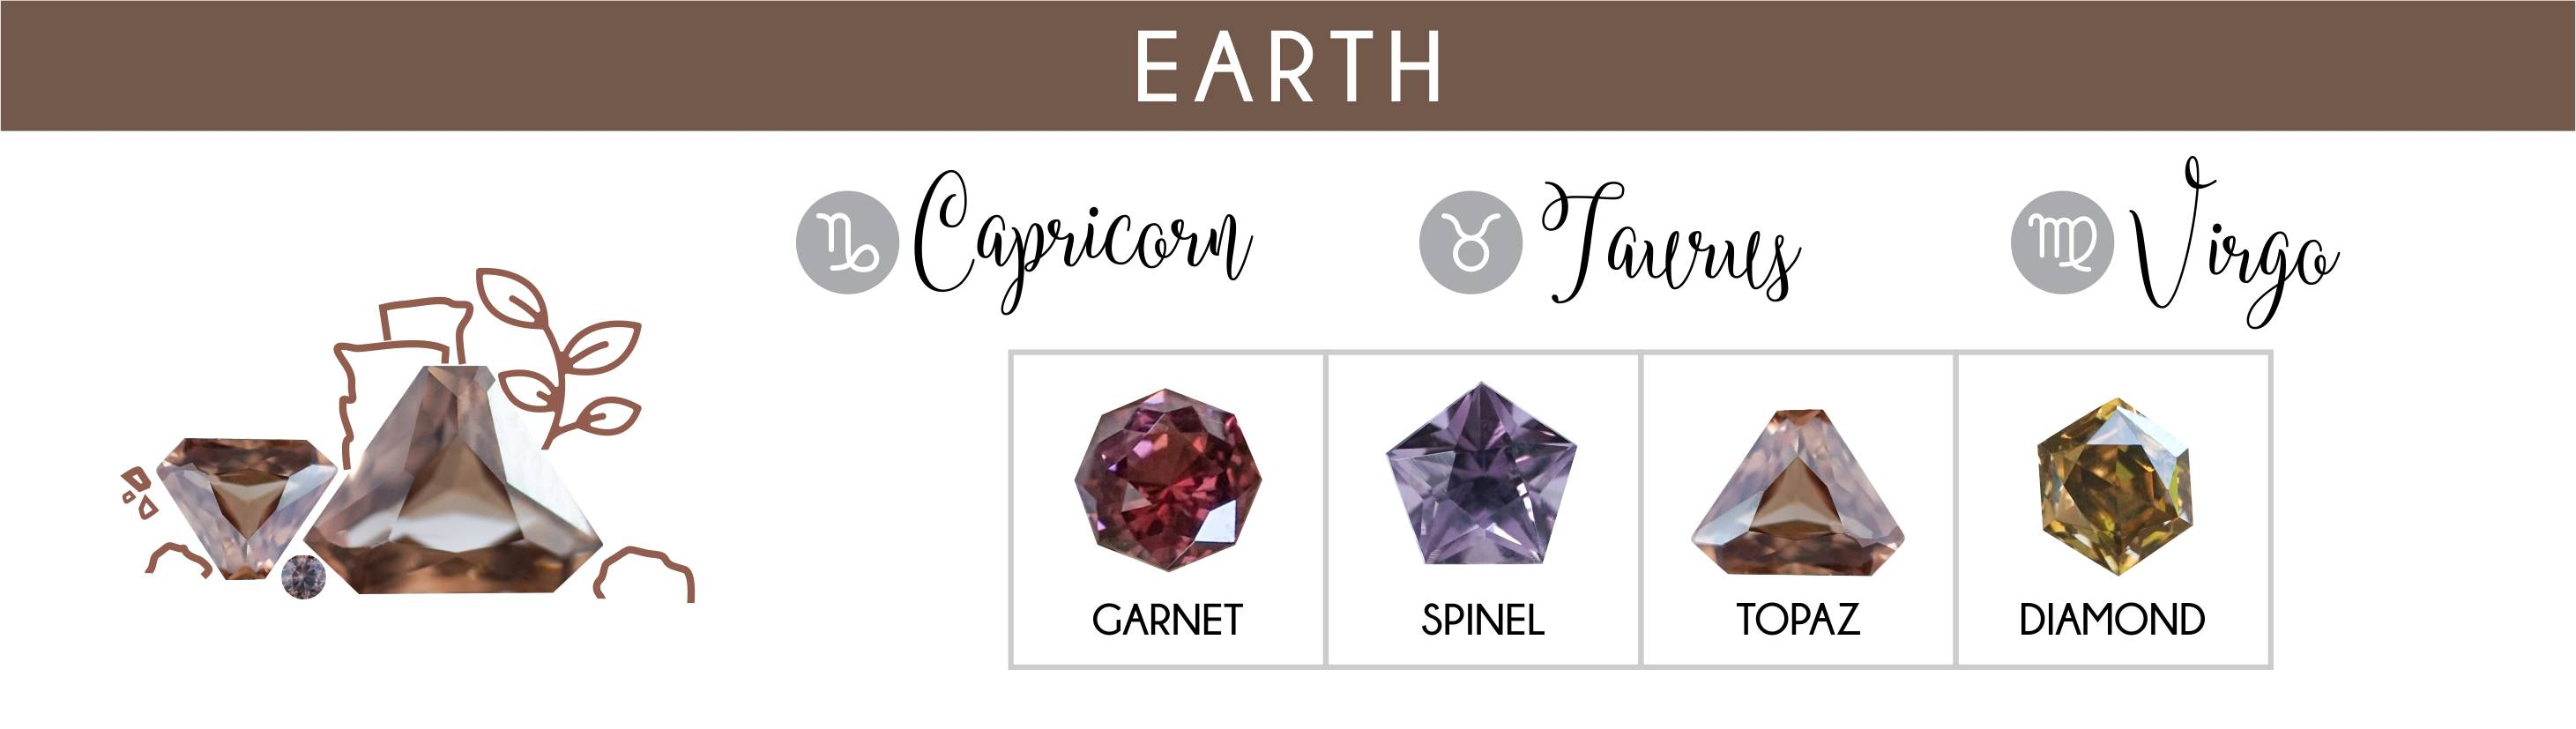 Earth element zodiacs: Capricorn, Taurus, and Virgo